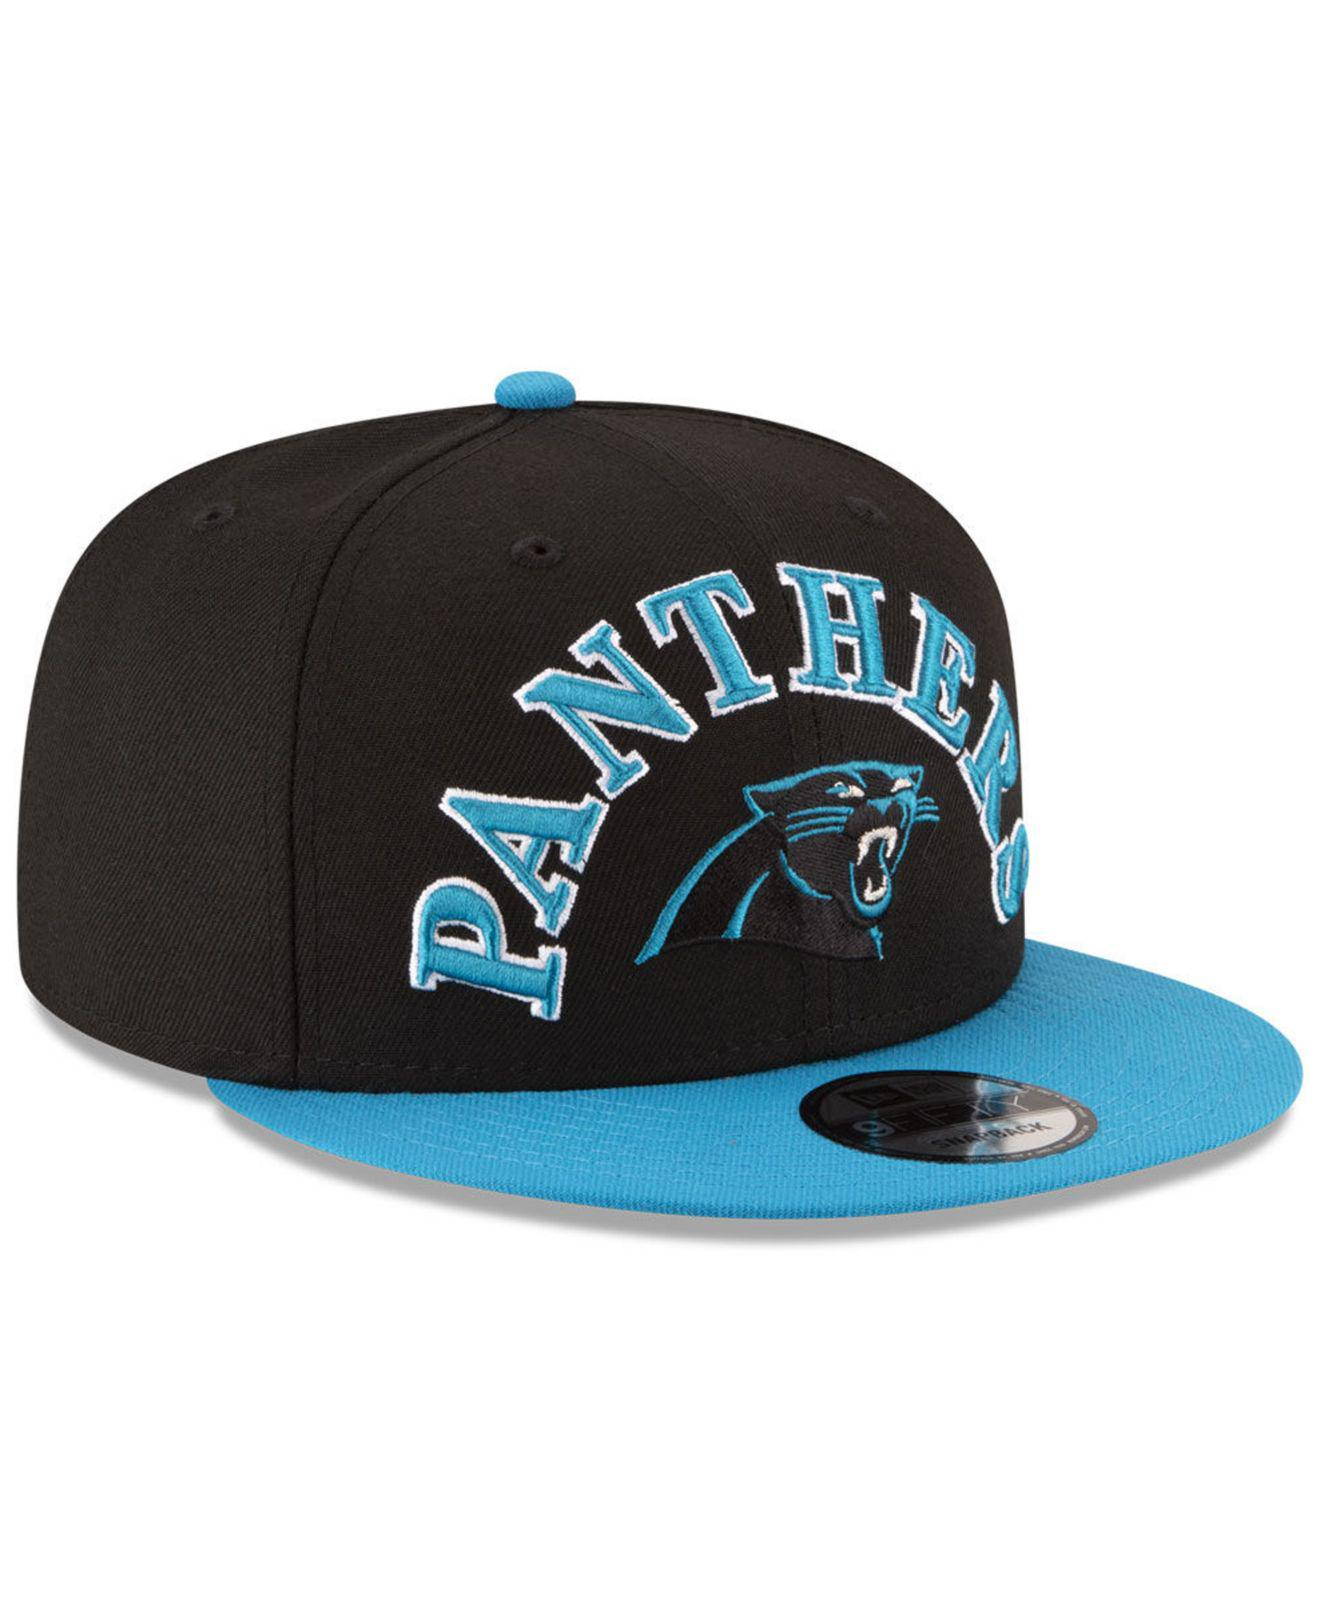 87ec26c5 Men's Black Carolina Panthers Retro Logo 9fifty Snapback Cap